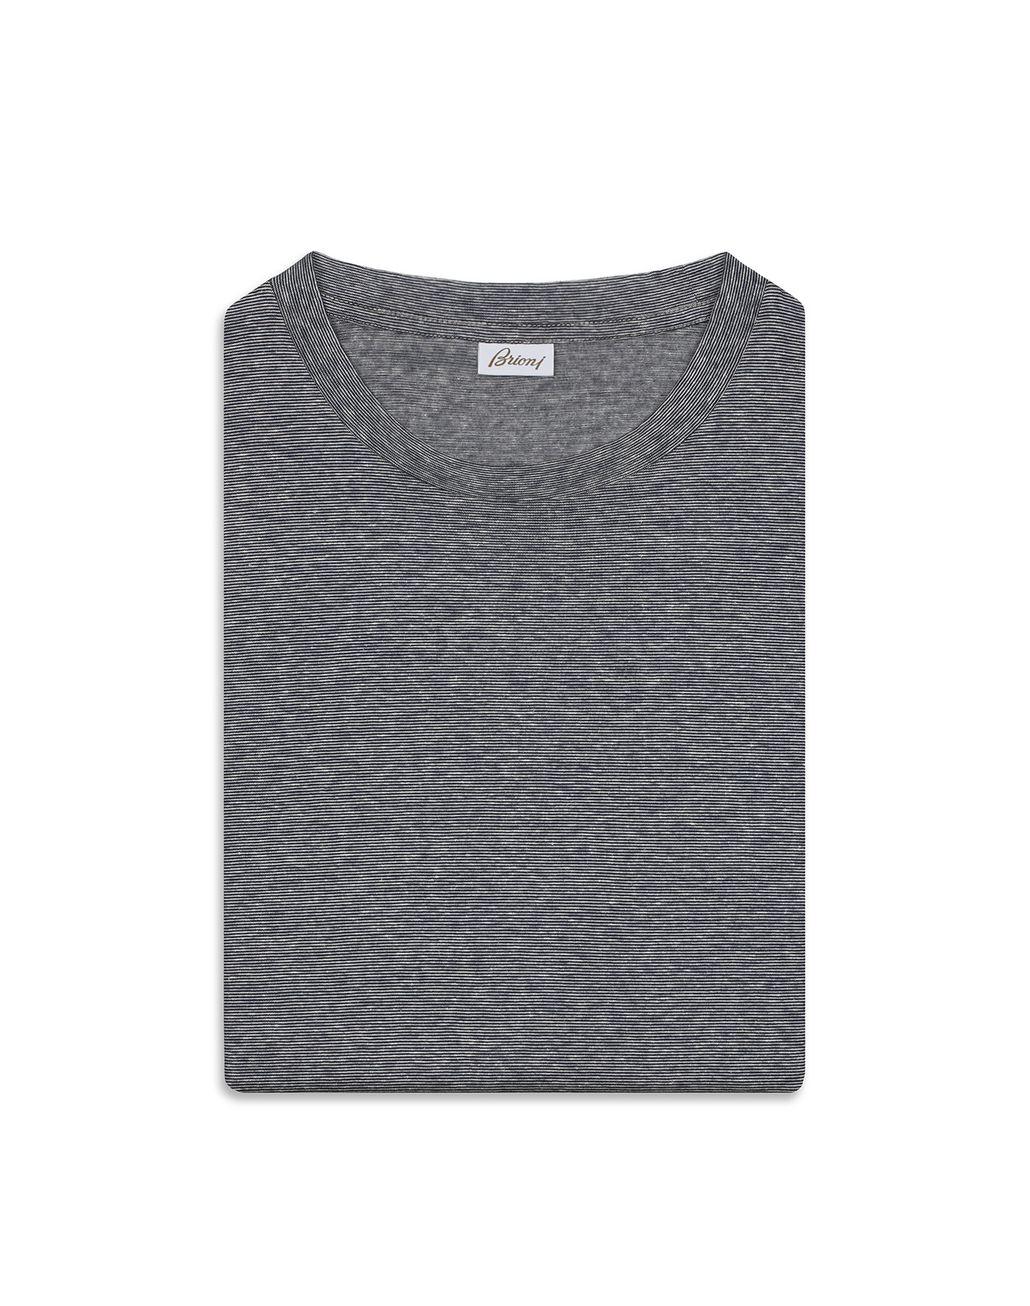 BRIONI Blue and White Thin Stripes T-Shirt T-Shirts & Polos Man e